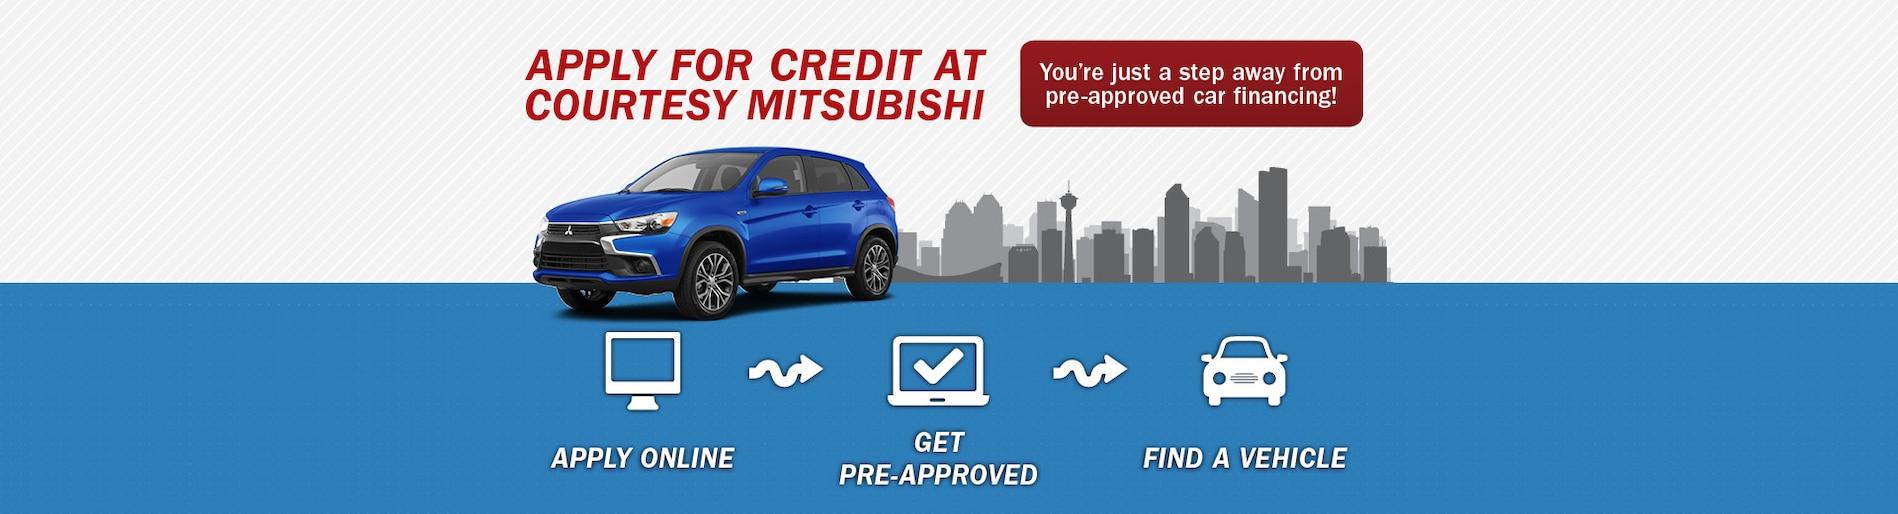 Mitsubishi Calgary AB | Cars, Trucks, and SUVs For Sale at Courtesy ...